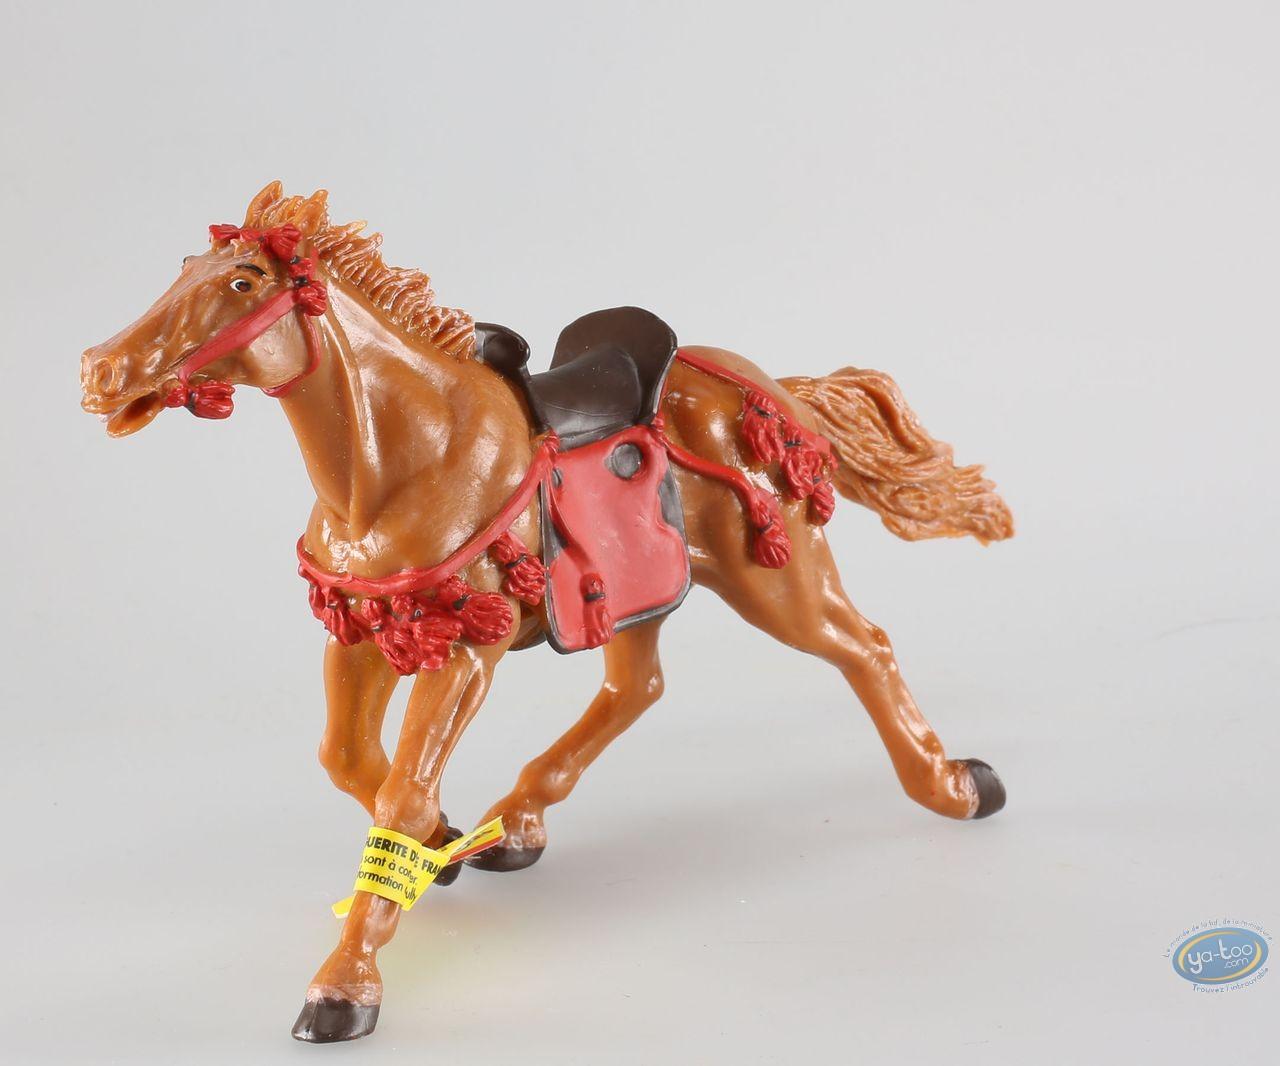 Figurine plastique, Samouraï : Cheval fauve arnachement rouge